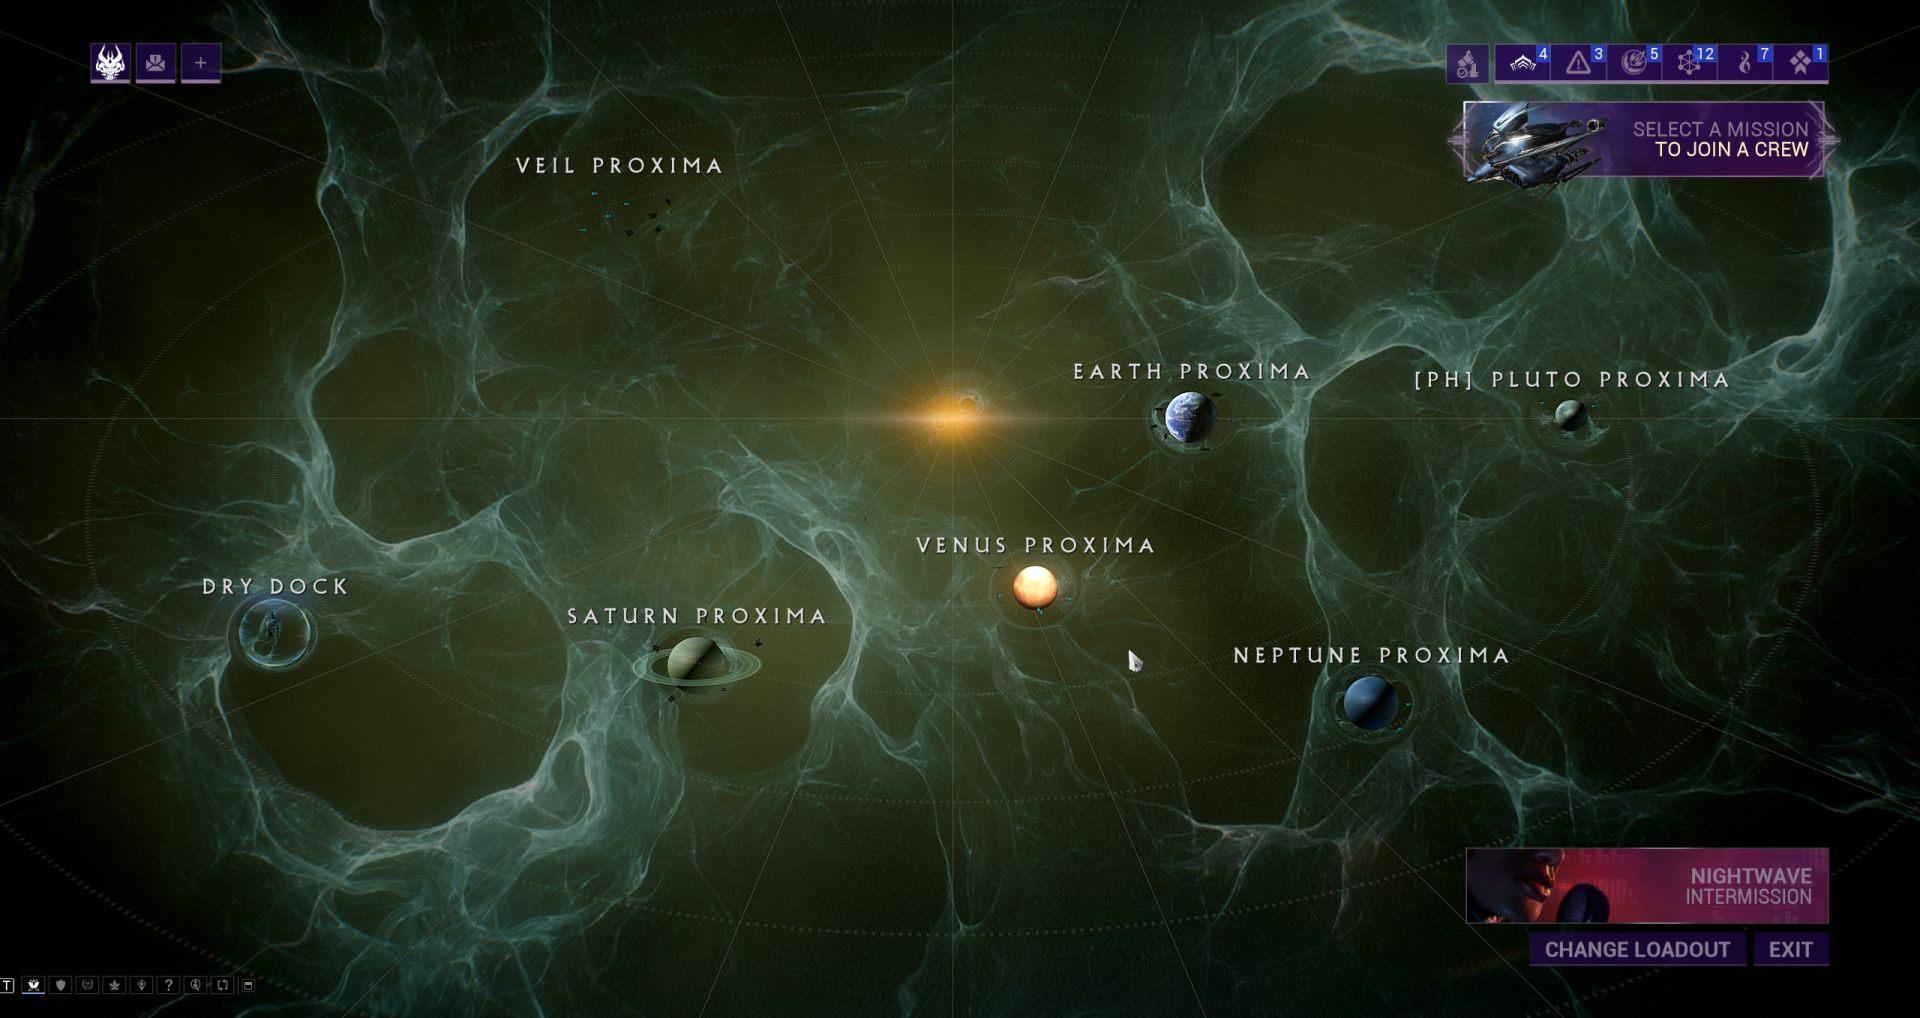 Regions.thumb.jpg.78c9fc29fb805a0975c316